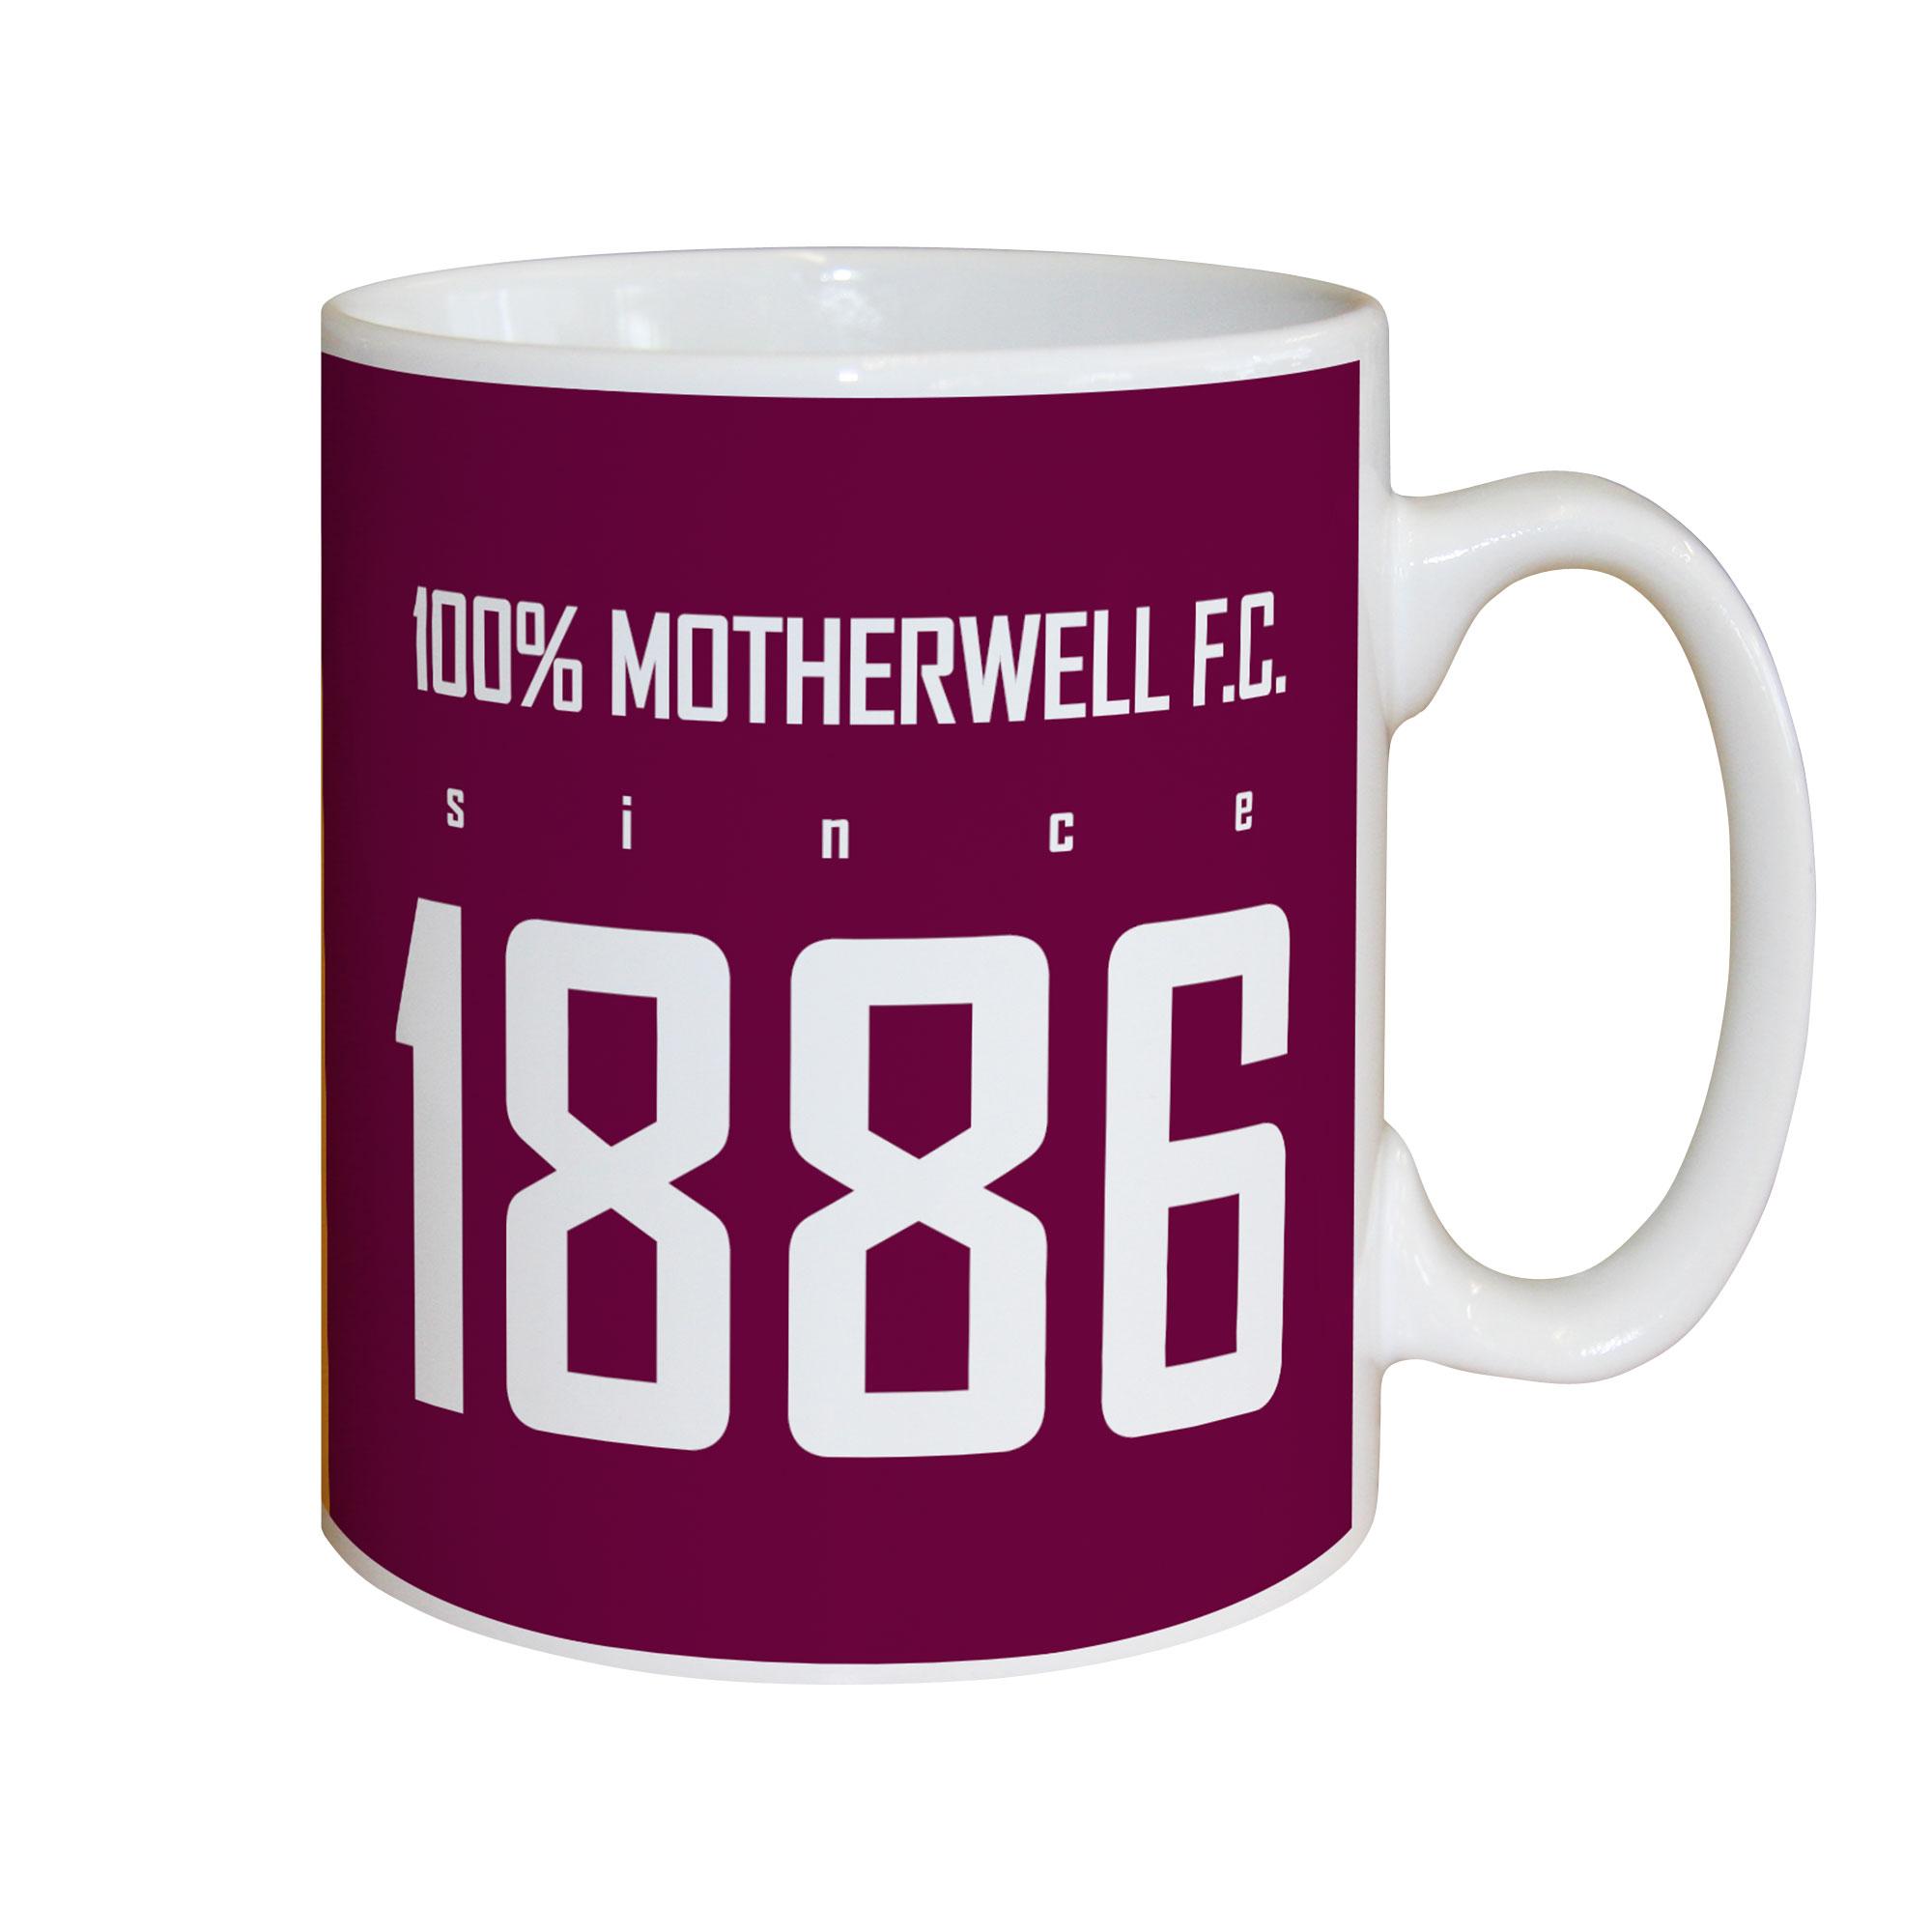 Motherwell FC 100 Percent Mug